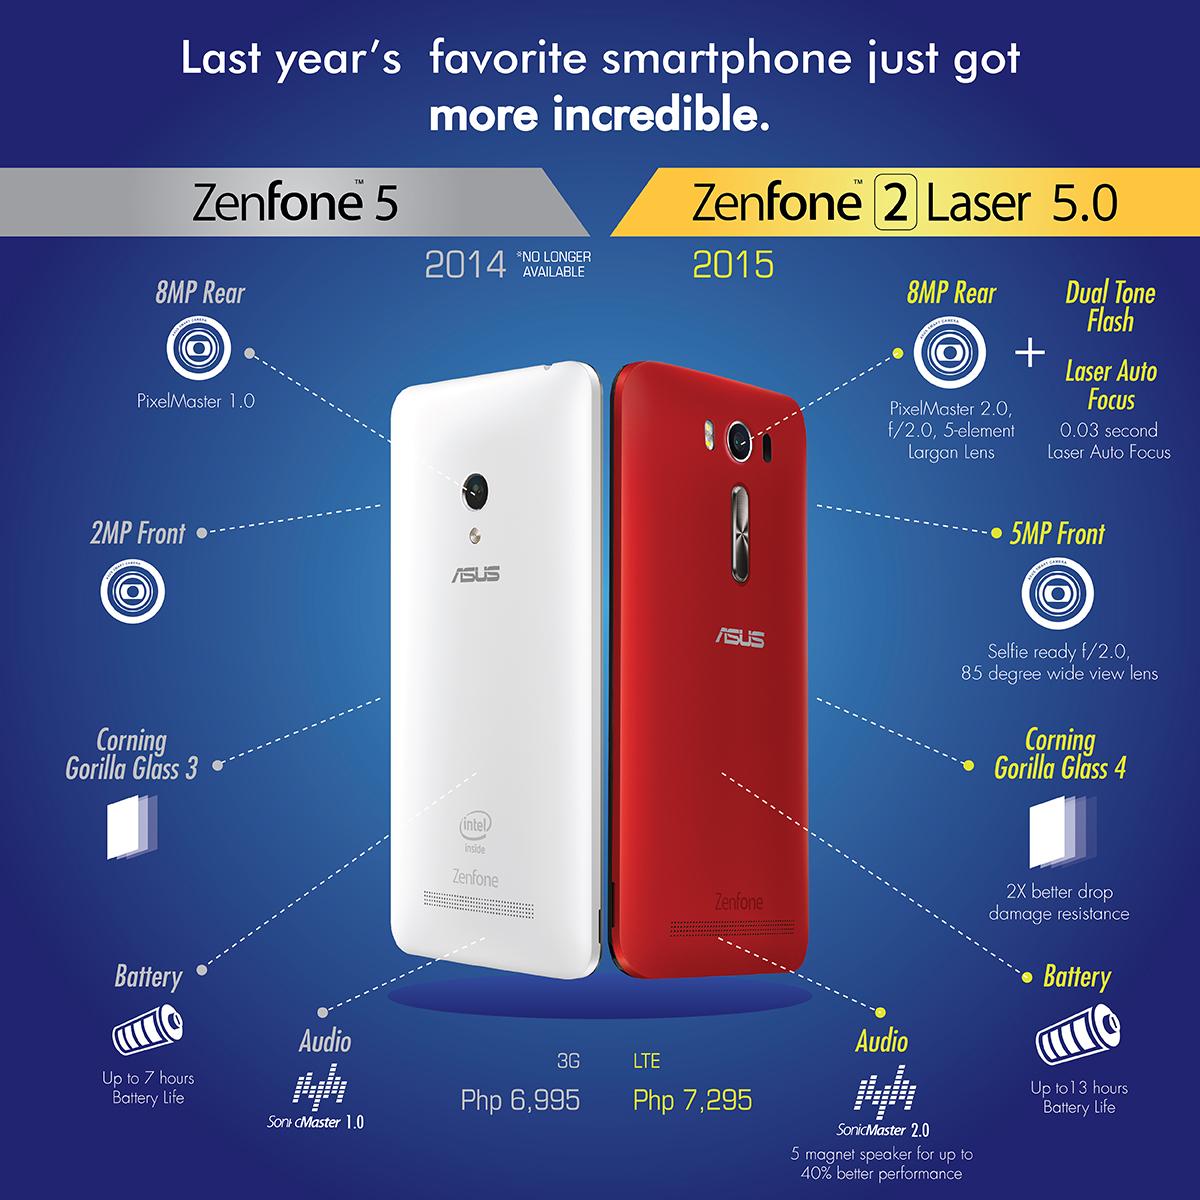 ZenFone 5 VS ZenFone 2 Laser 5.0